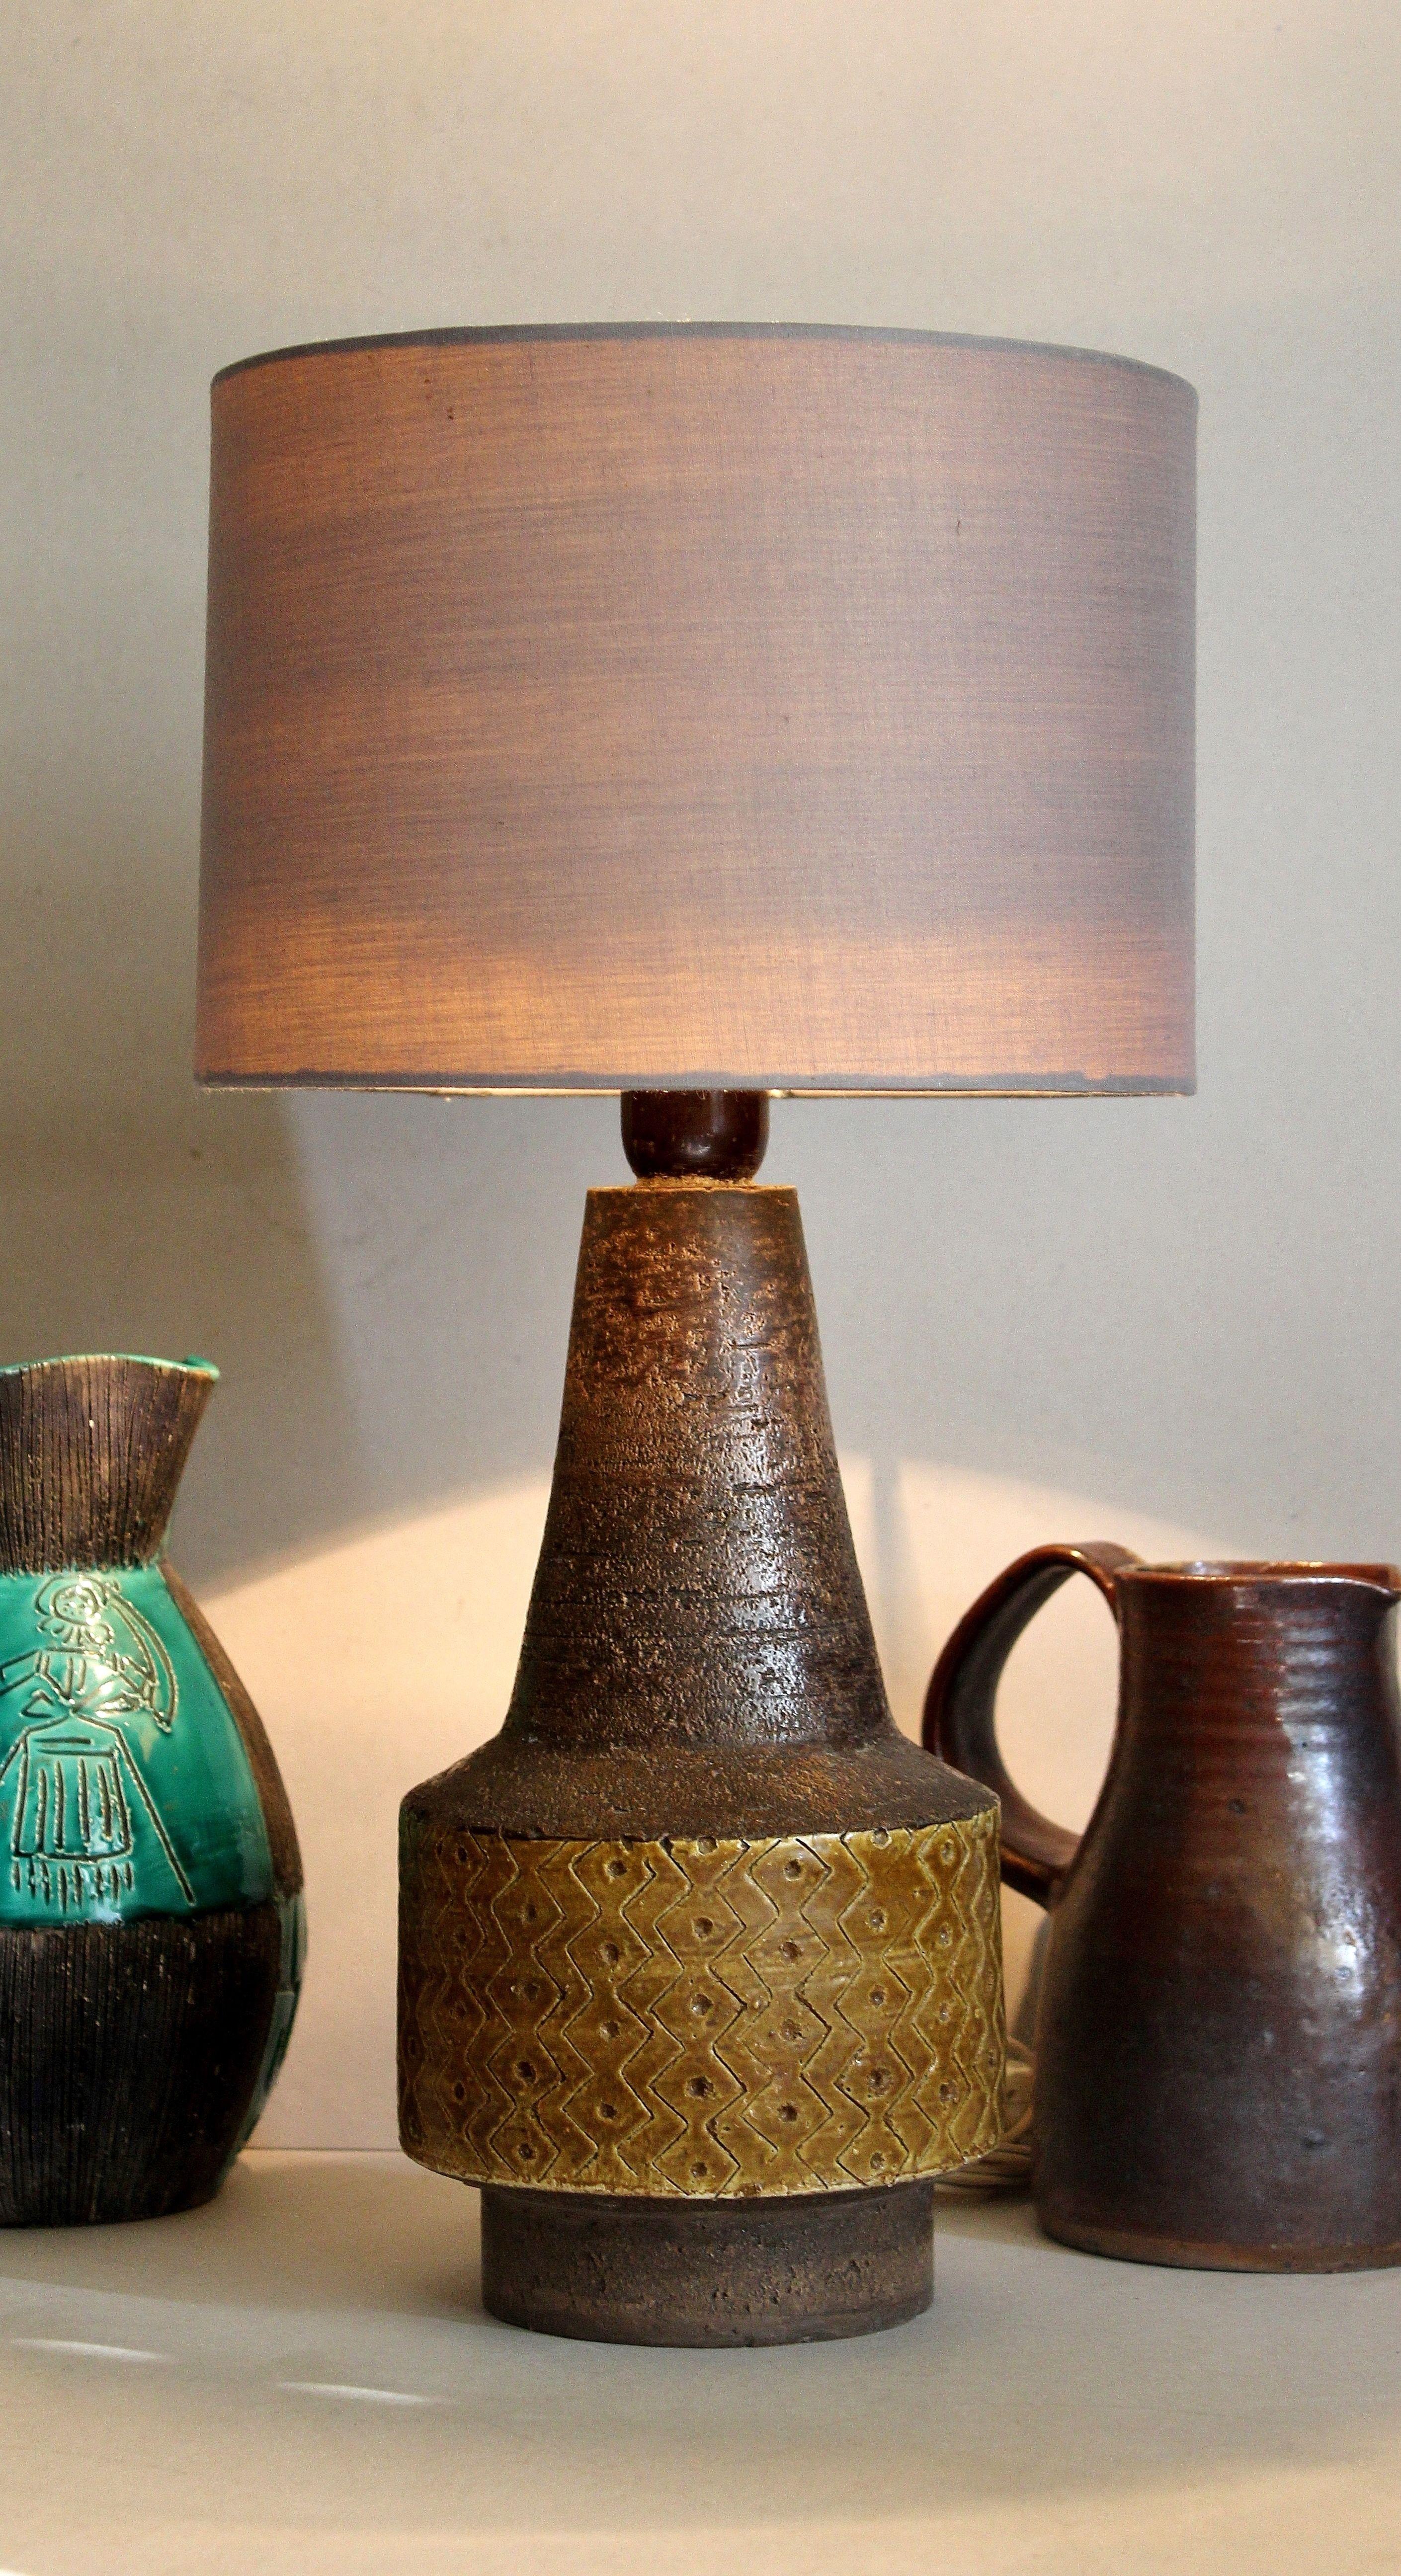 Bitossi Aldo Londi Ceramic Table Lamp 1960s Stoneware With Etsy Vintage Italian Pottery Mid Century Modern Ceramics Ceramic Table Lamps